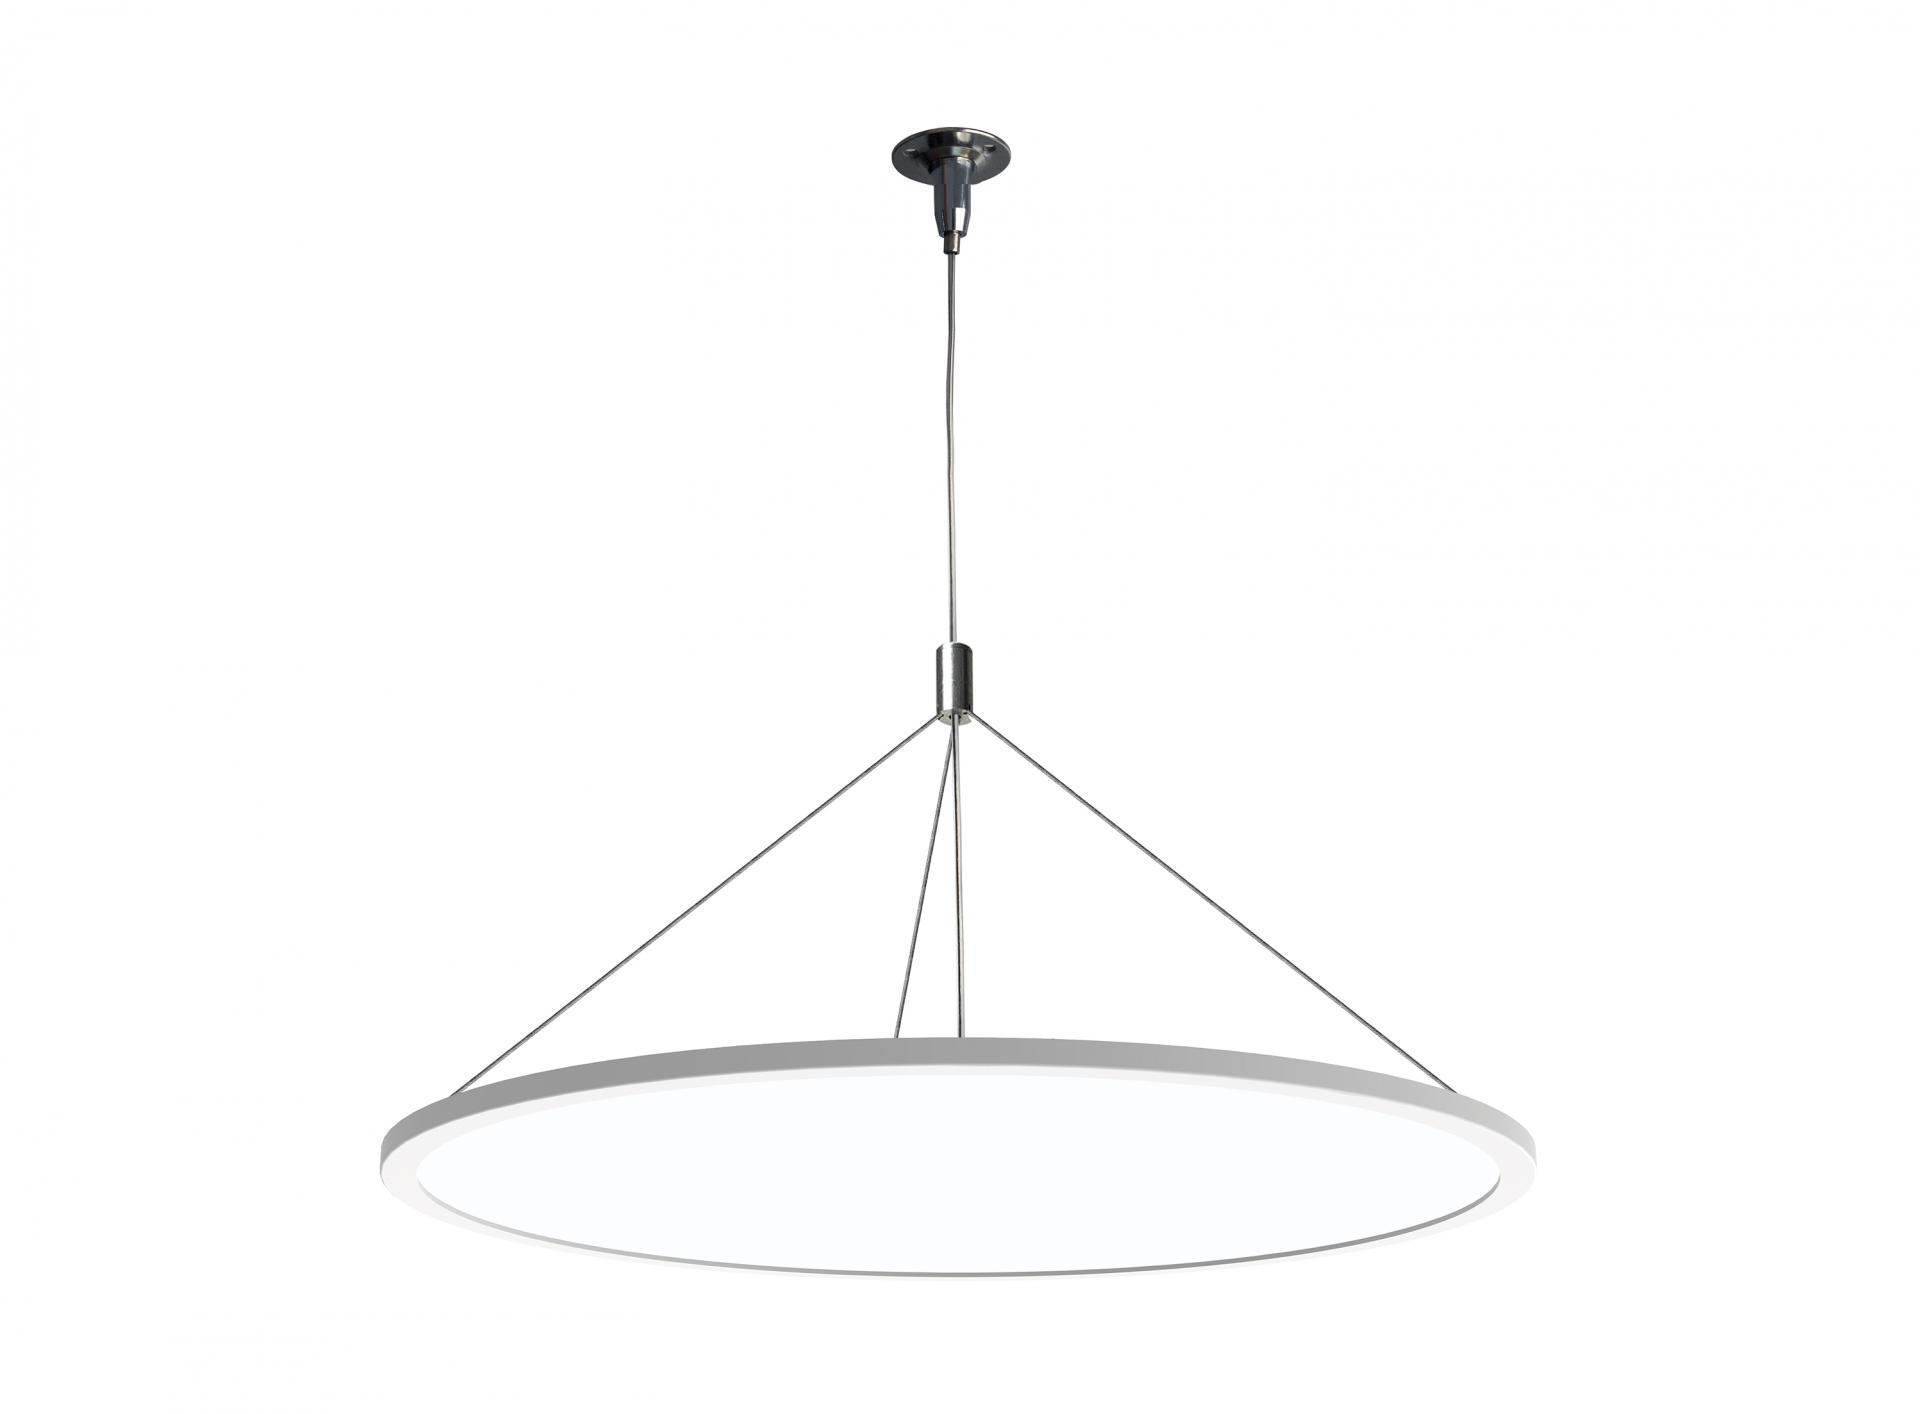 LAMPARA DE TECHO LED COLGANTE 48W 3000K 120º 230V BLANCO